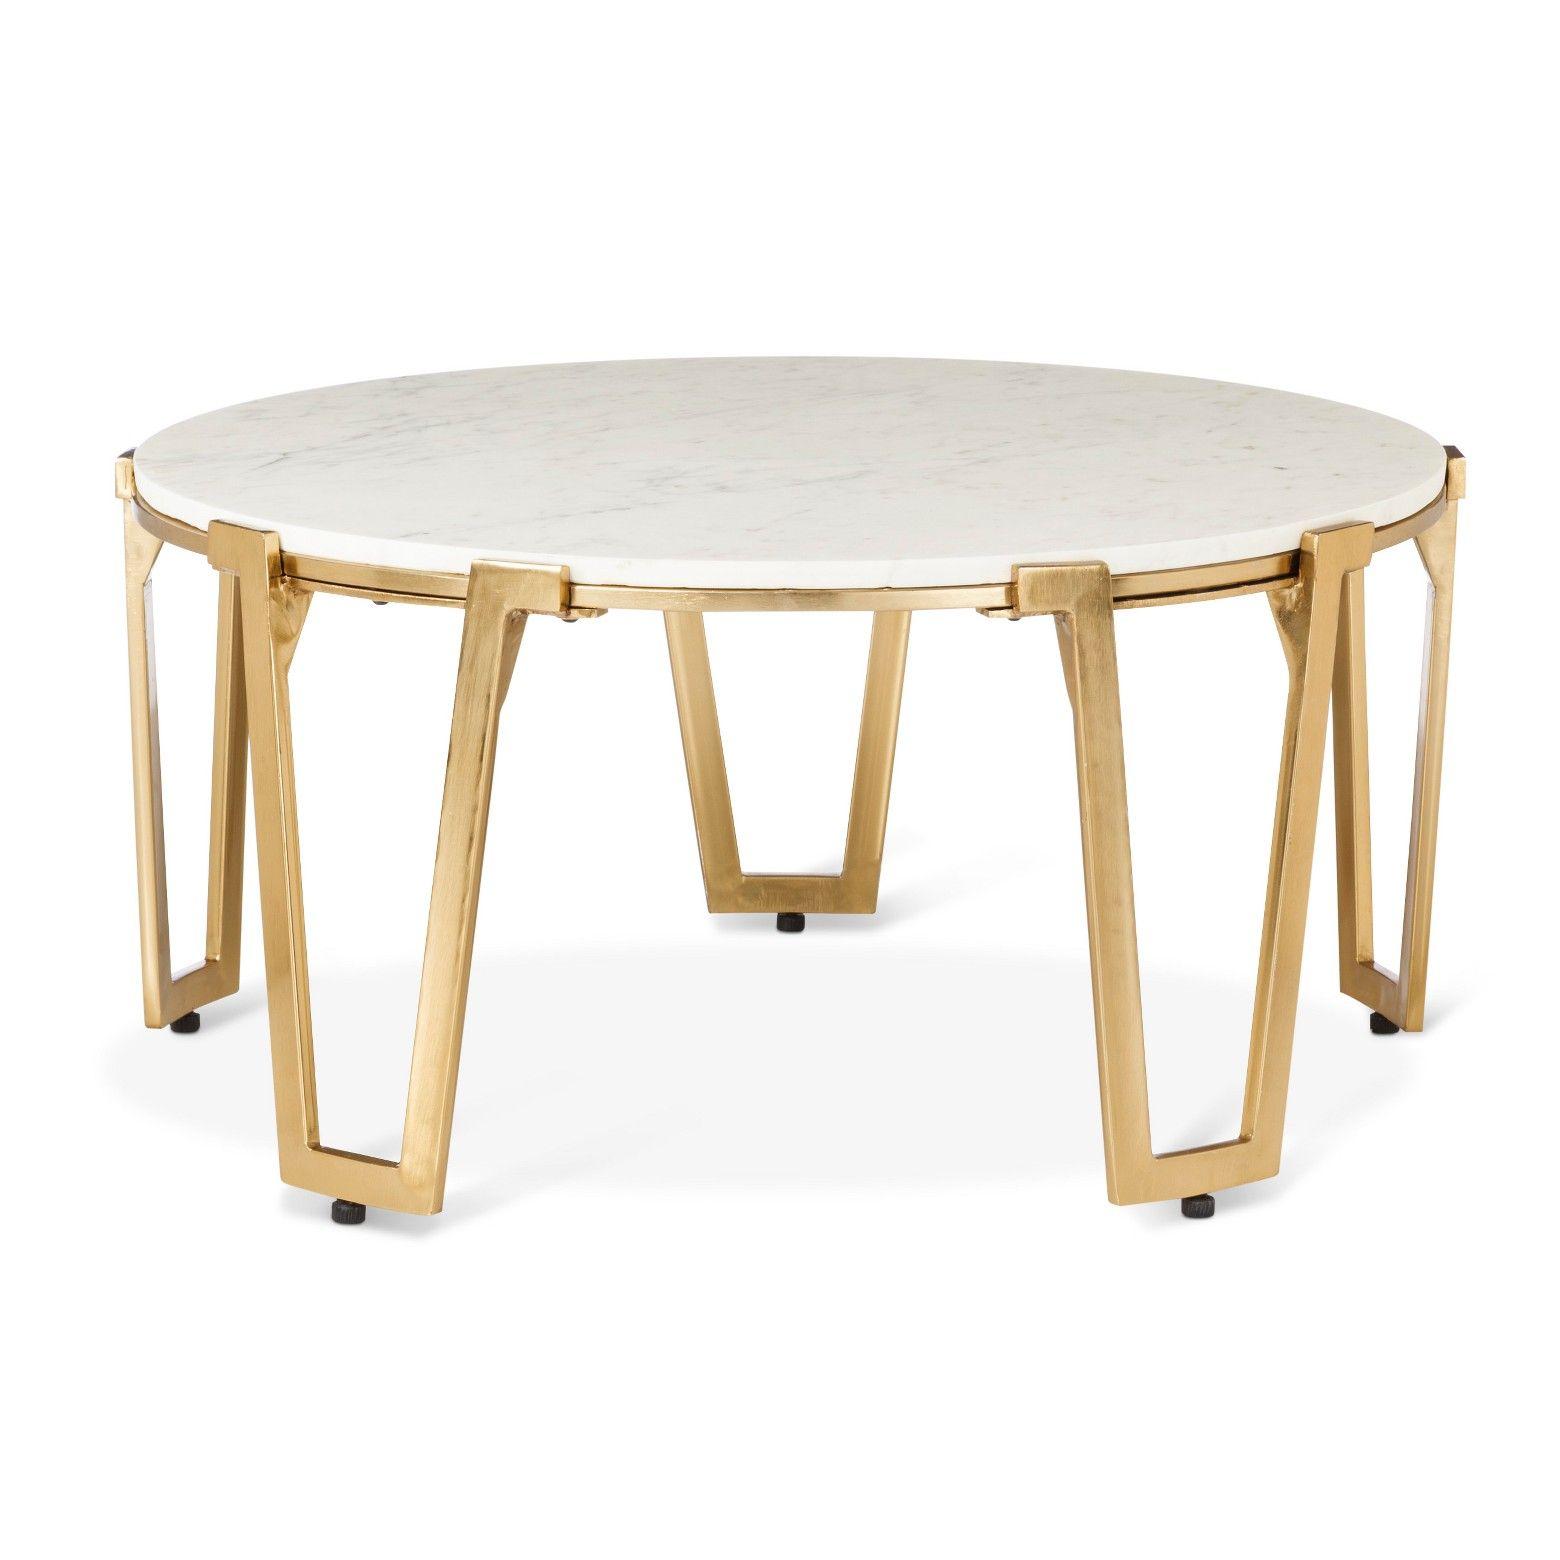 Brass and Marble Coffee Table Nate Berkus Nate berkus Tabletop